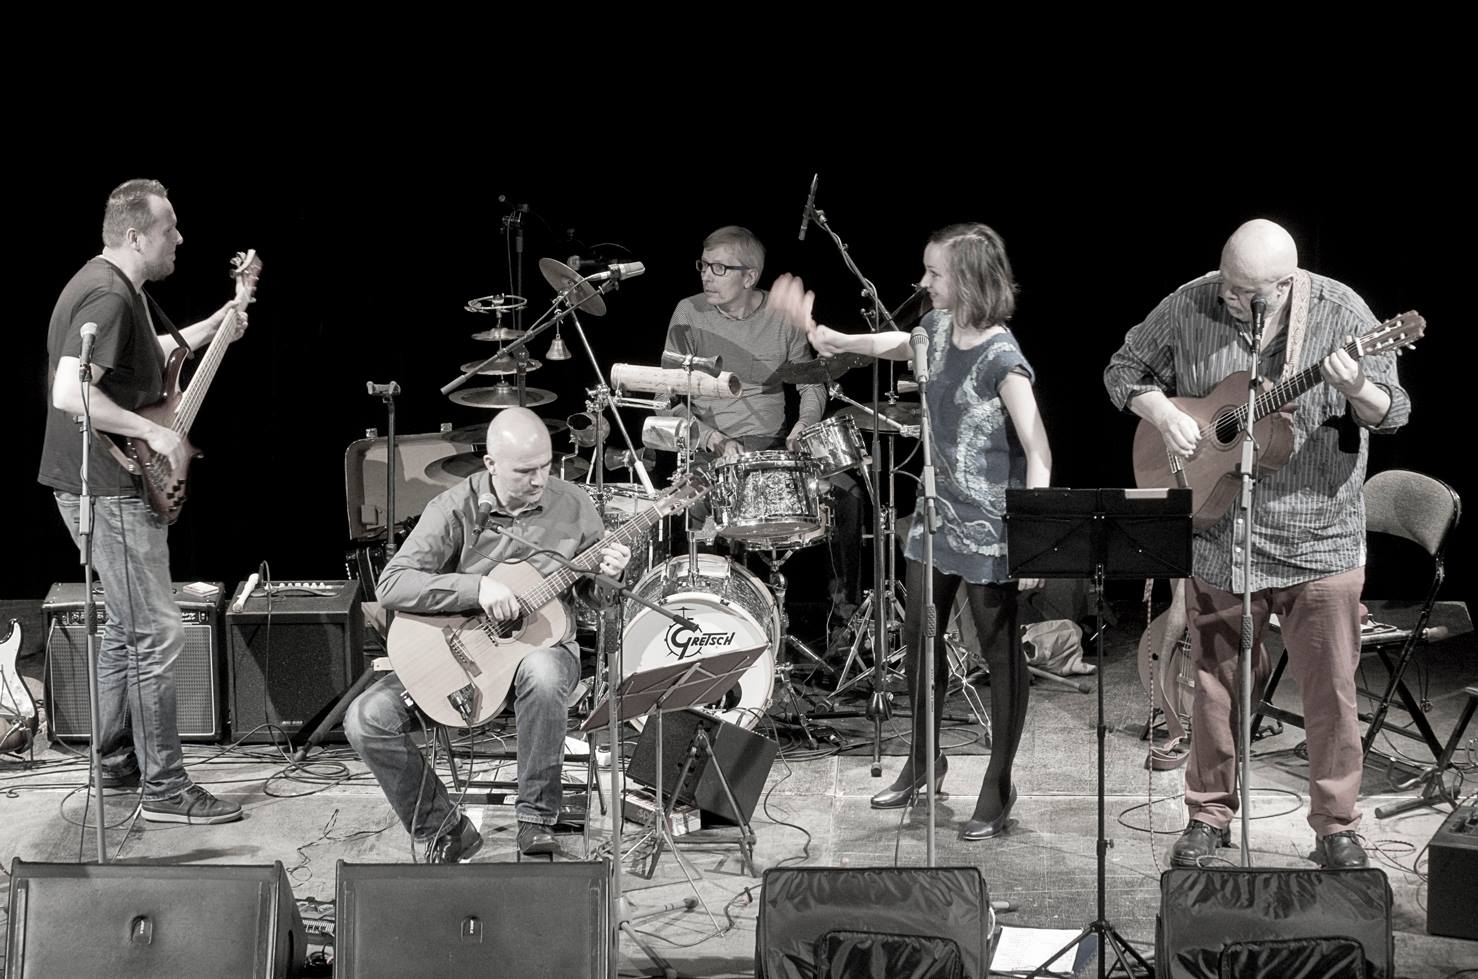 Jablkoň - zleva: Johnny Judl, Martin Carvan, Marie Puttnerová, Michal Němec. Vzadu: Petr Chlouba